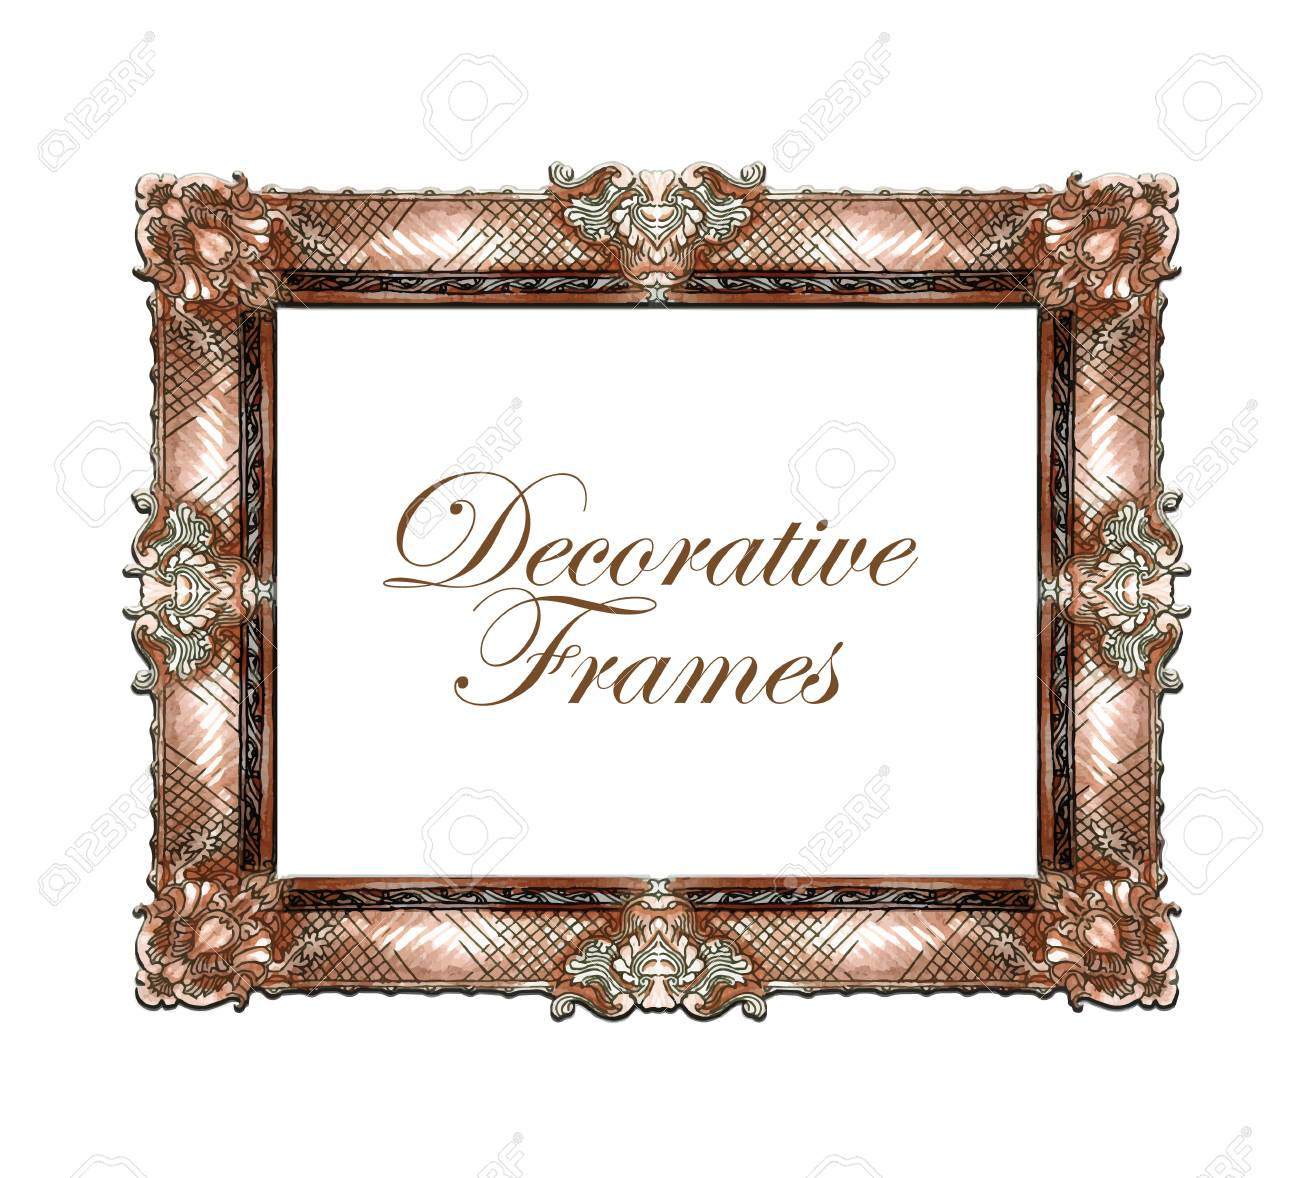 Hand Made Sketch Of Ornate Frames. Vector Illustration. Royalty Free ...